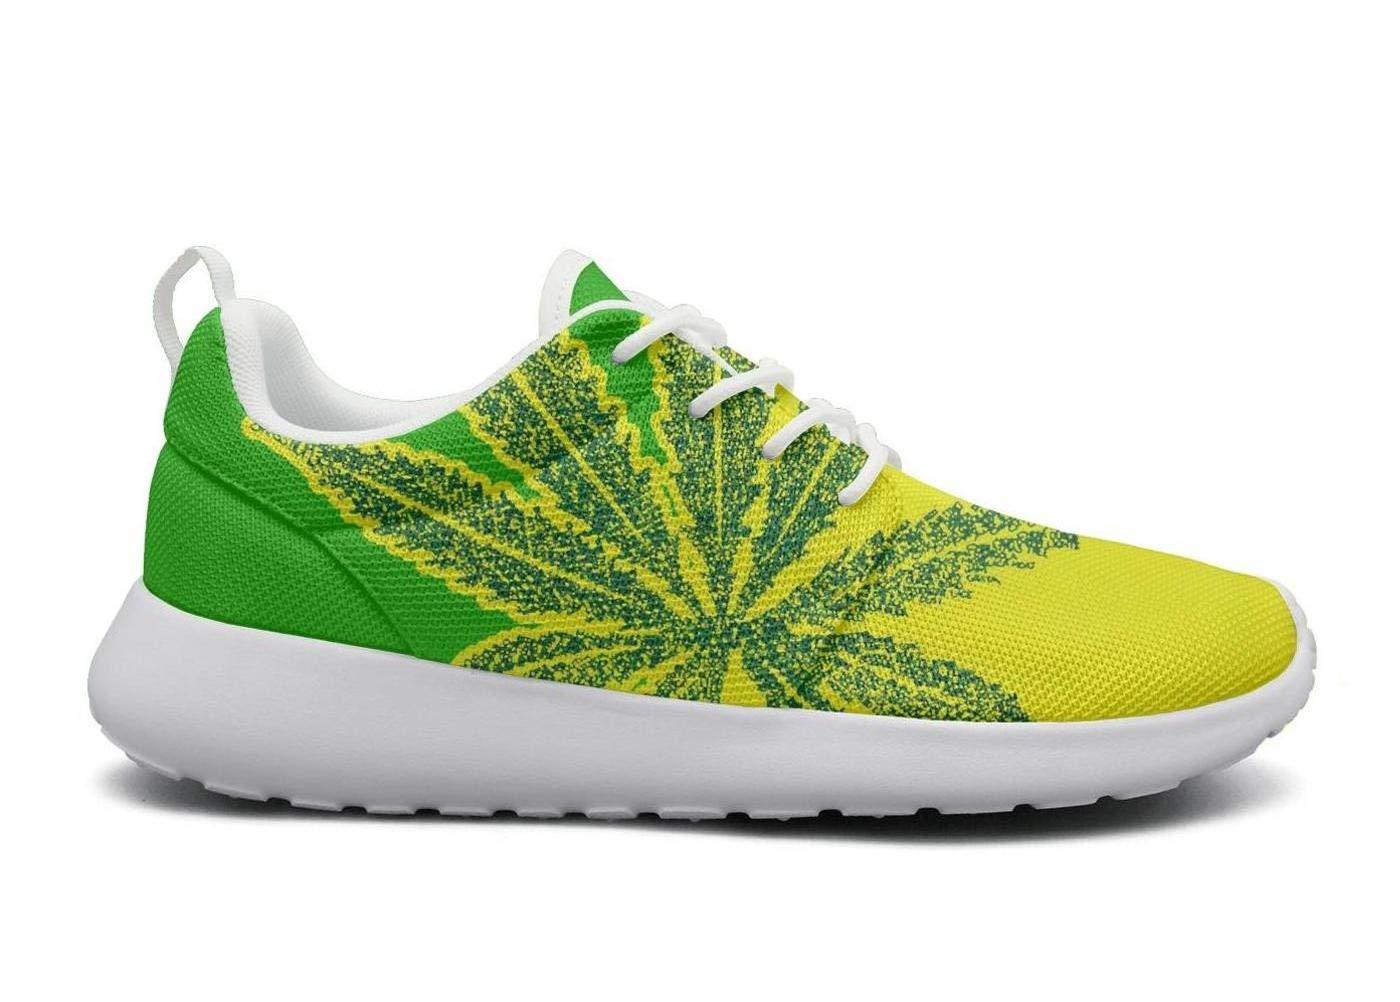 Skull Chef Weed Shoes Marijuana Womens Running Unisex Shoes Cannabis Tennis Sneakers for Women Man